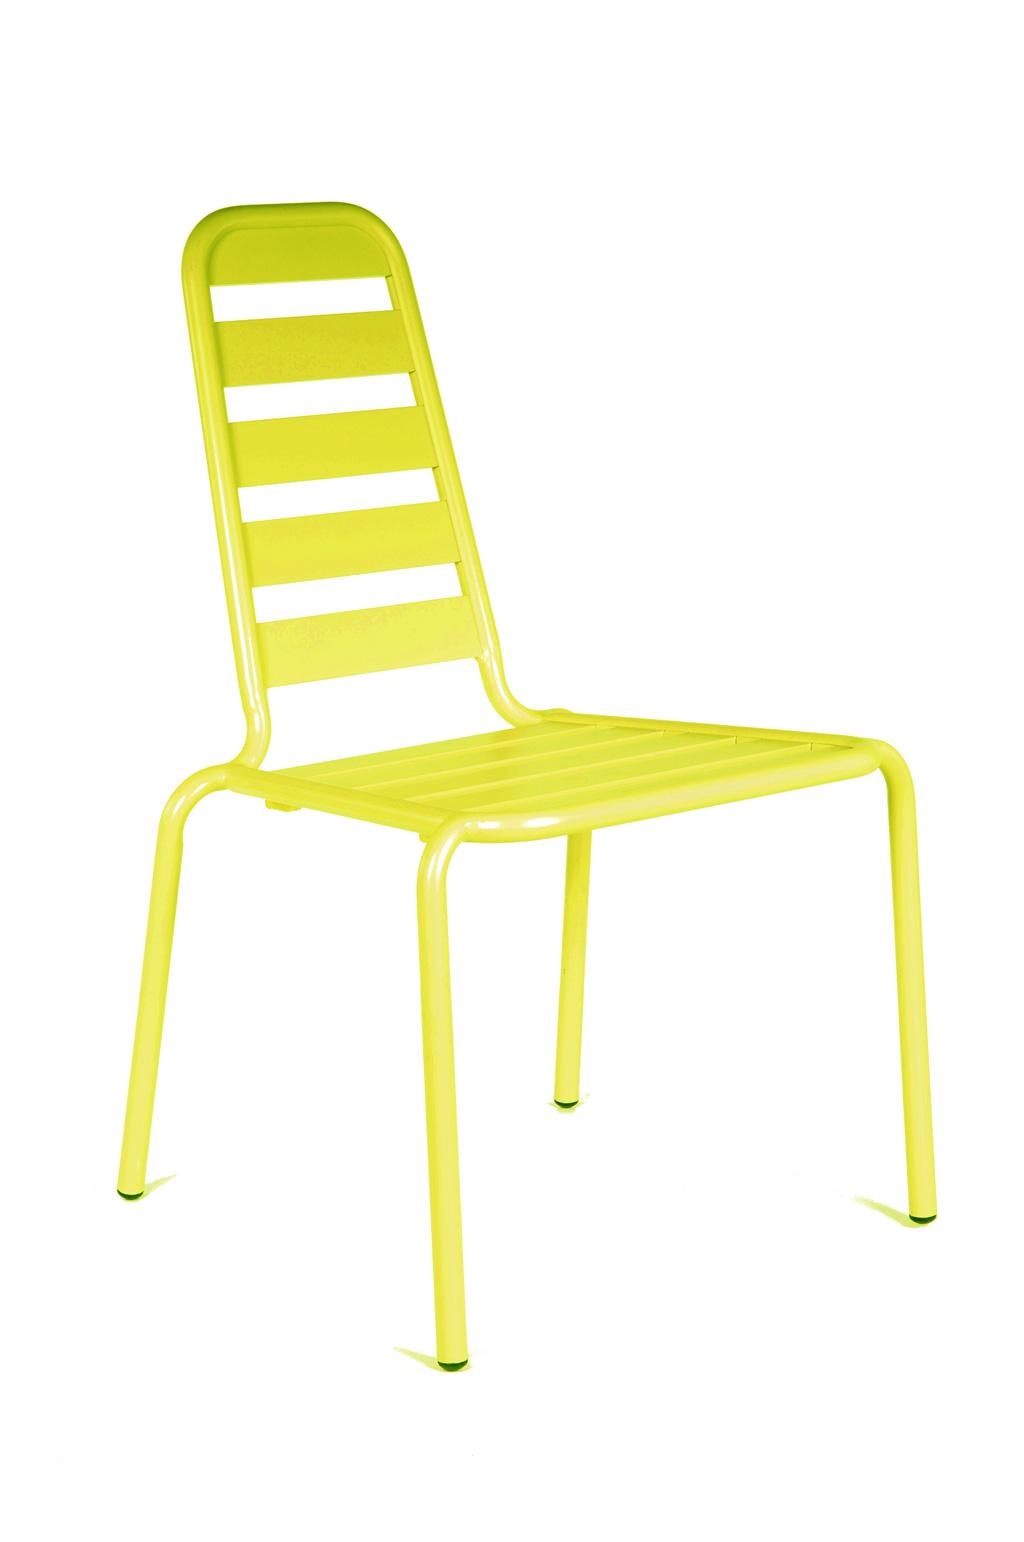 chaise menu lemon oceo sun mobilier. Black Bedroom Furniture Sets. Home Design Ideas